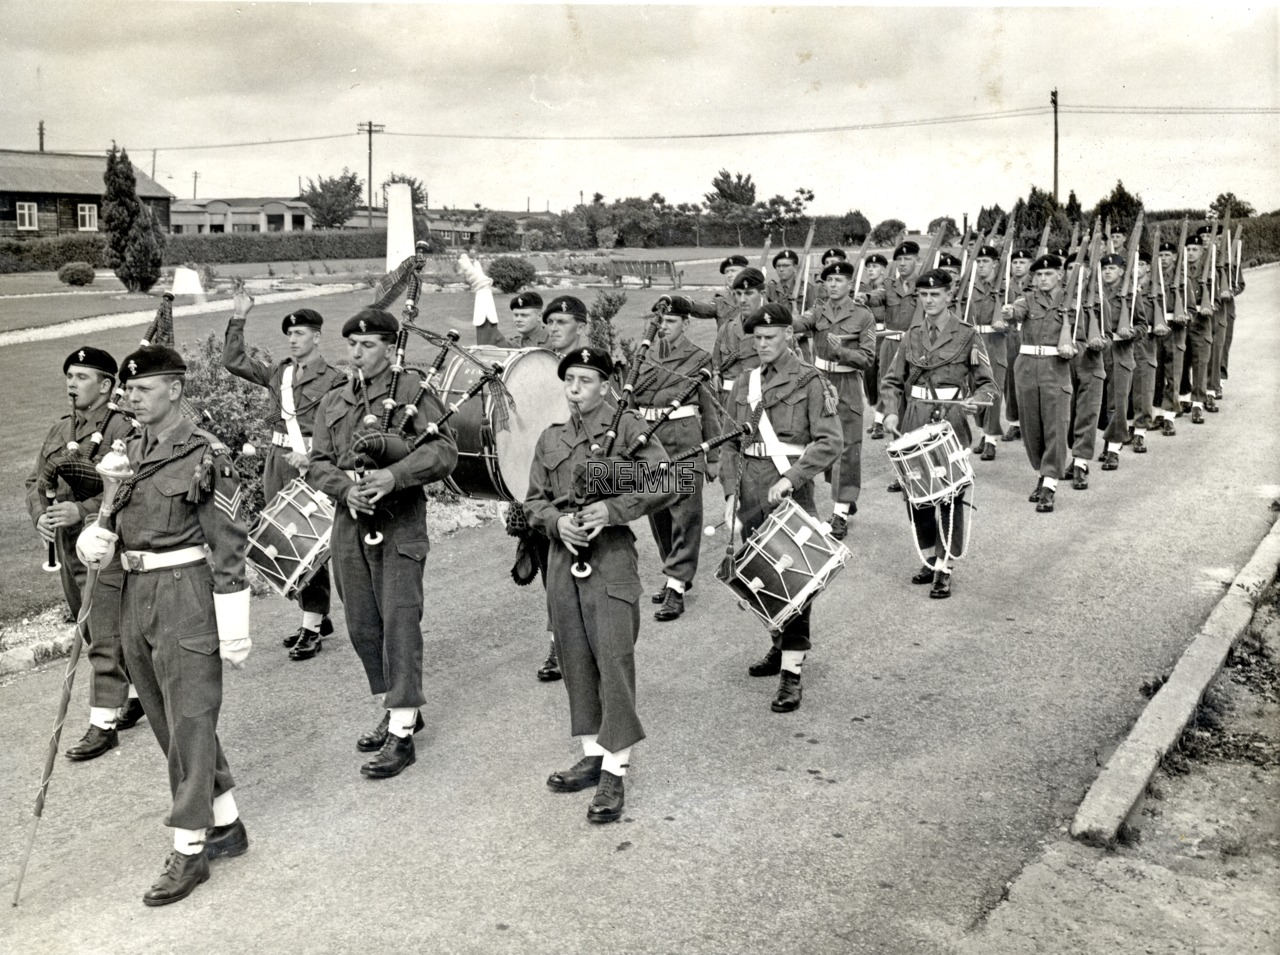 No 1 Training Battalion REME Pipe Band